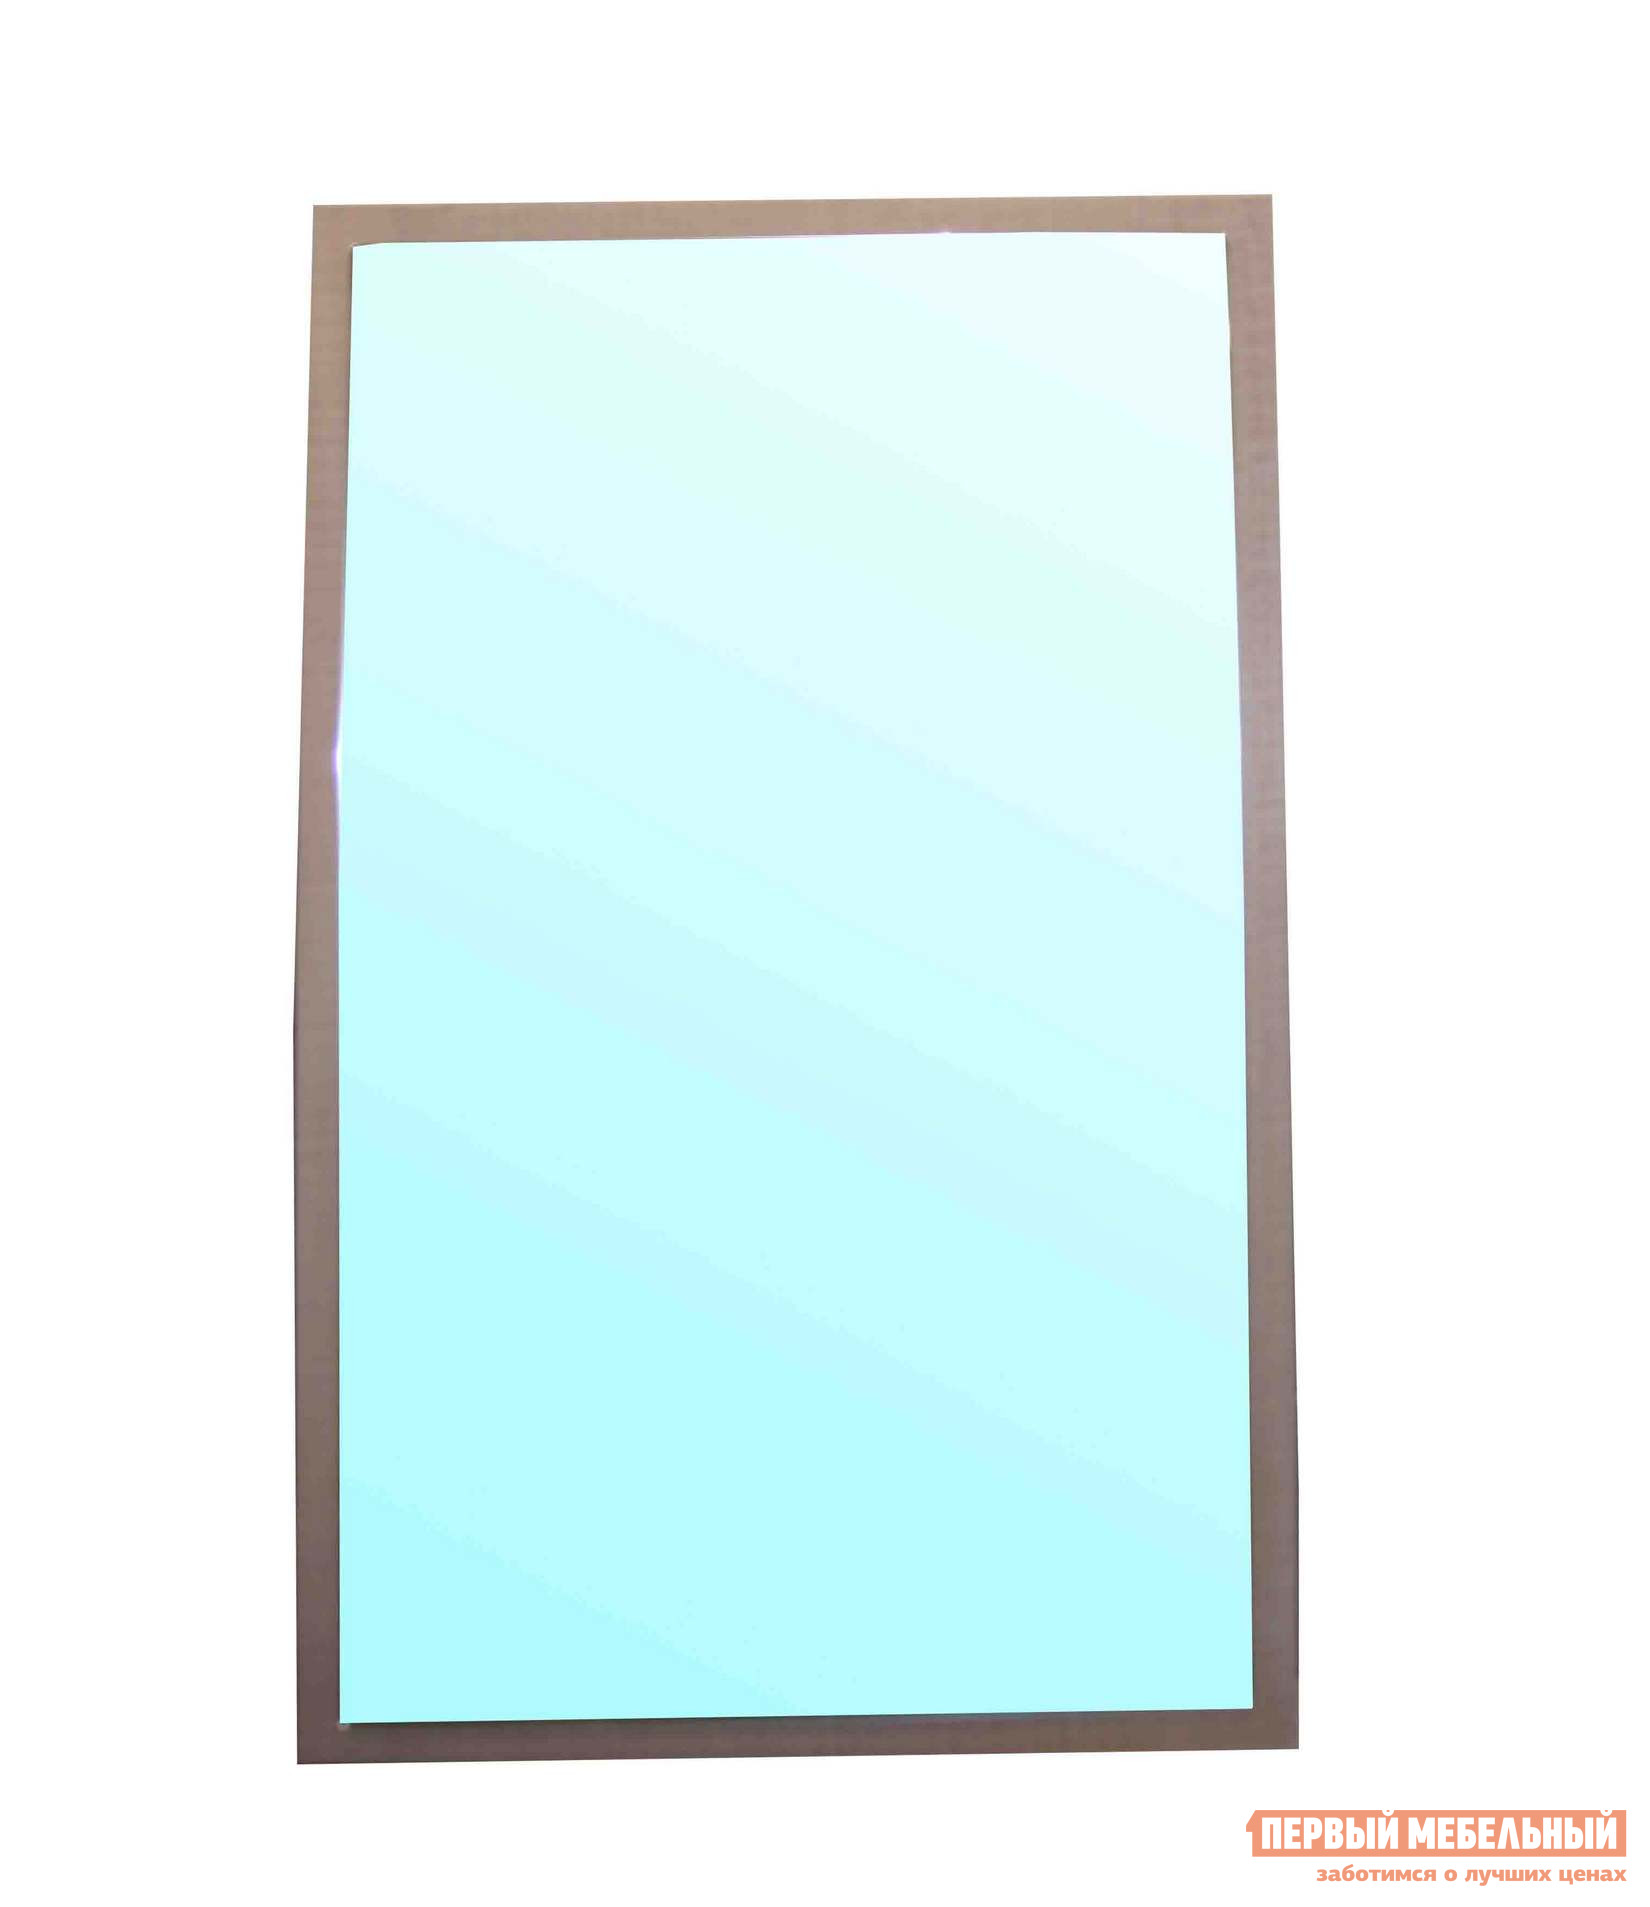 Настенное зеркало МО РОСТ Зеркало Первой цены Мадейра